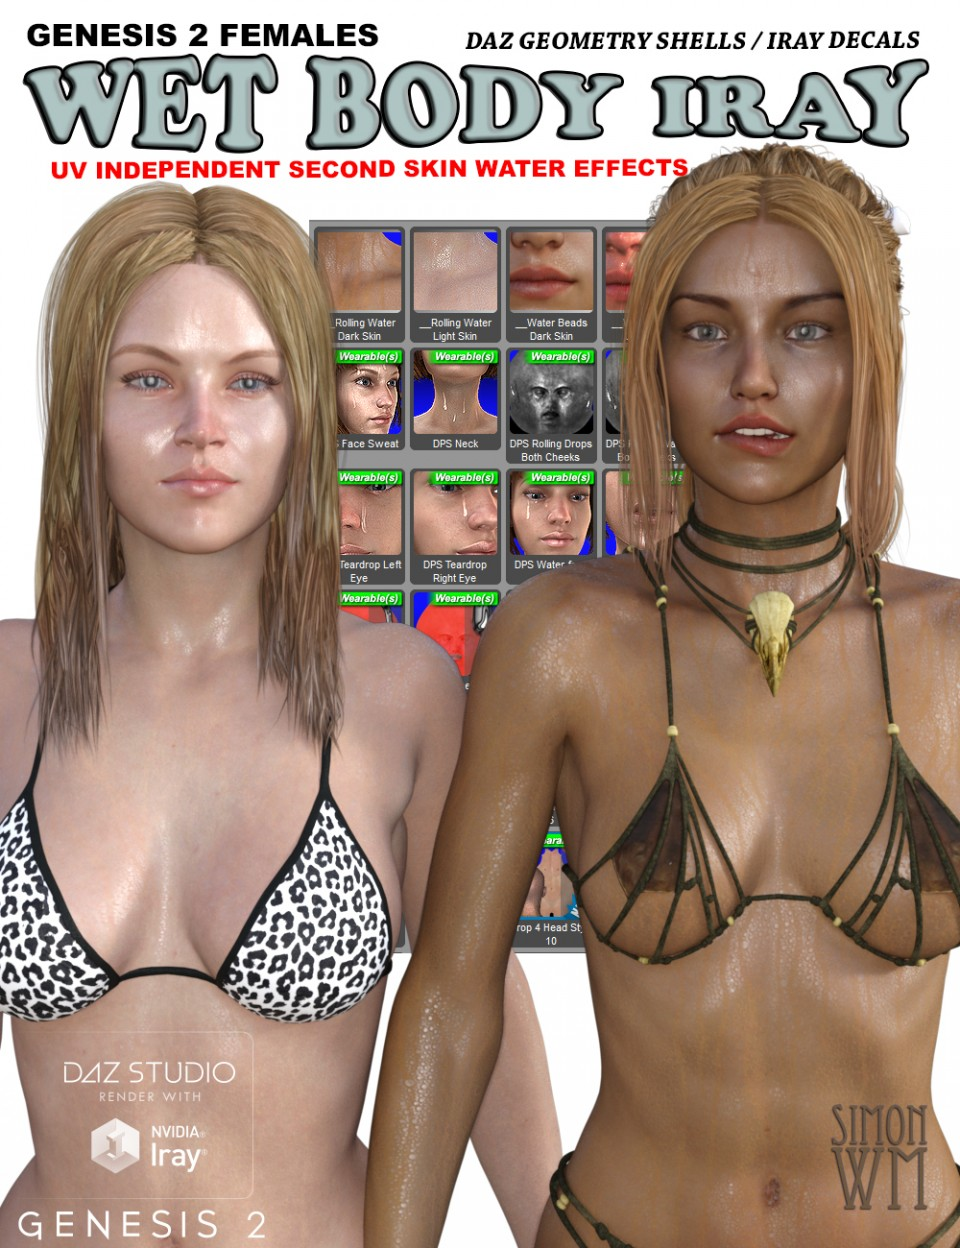 Genesis 2 Female(s) Wet Body Iray_DAZ3D下载站